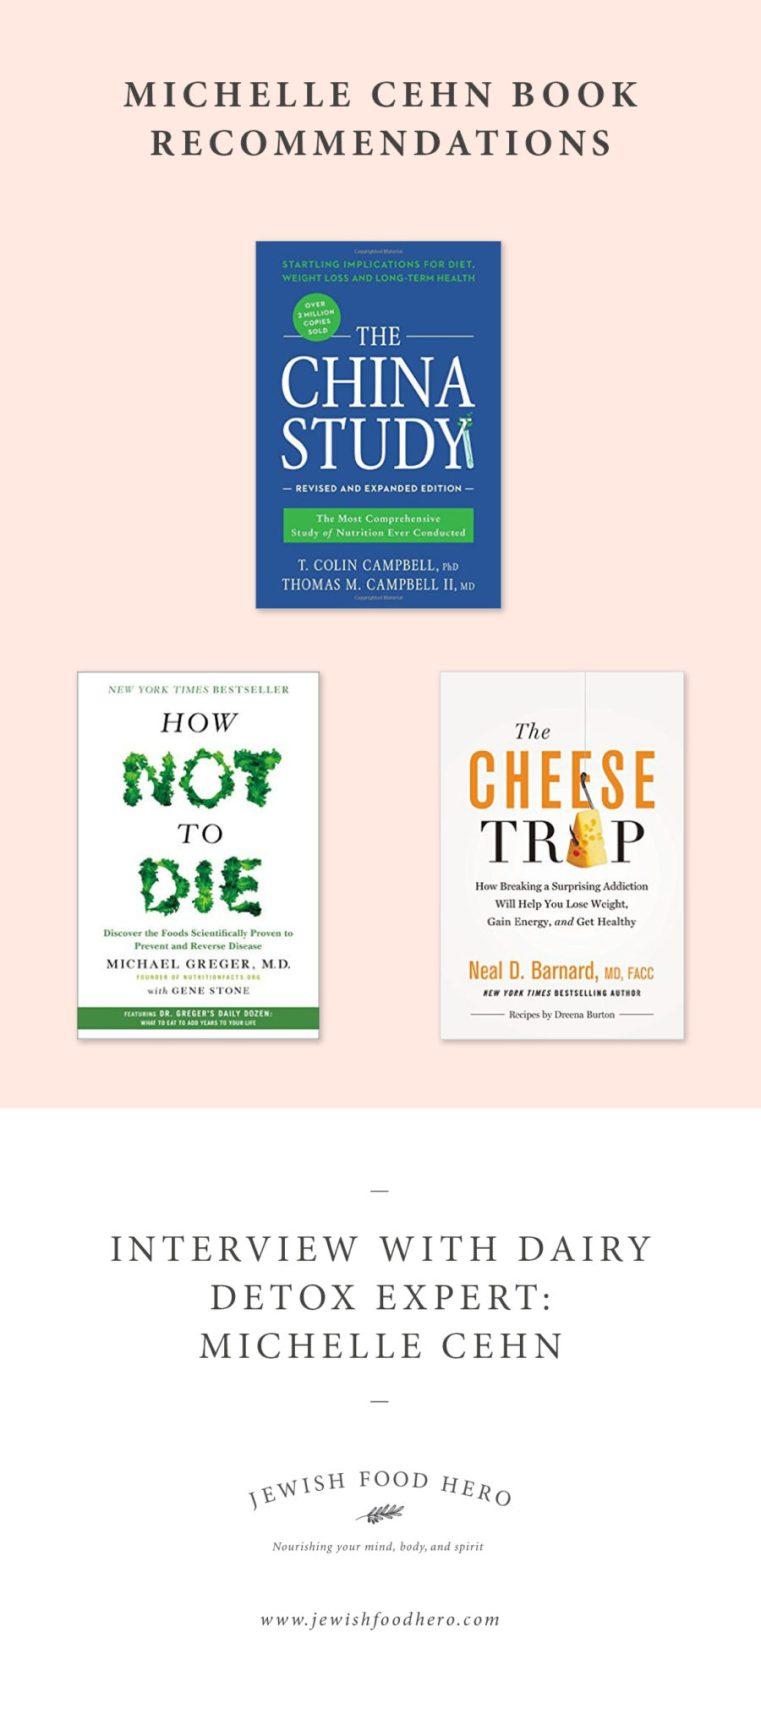 dairy detox, book recommendations, going vegan, vegan diet, dairy free, cutting dairy, easy vegan diet